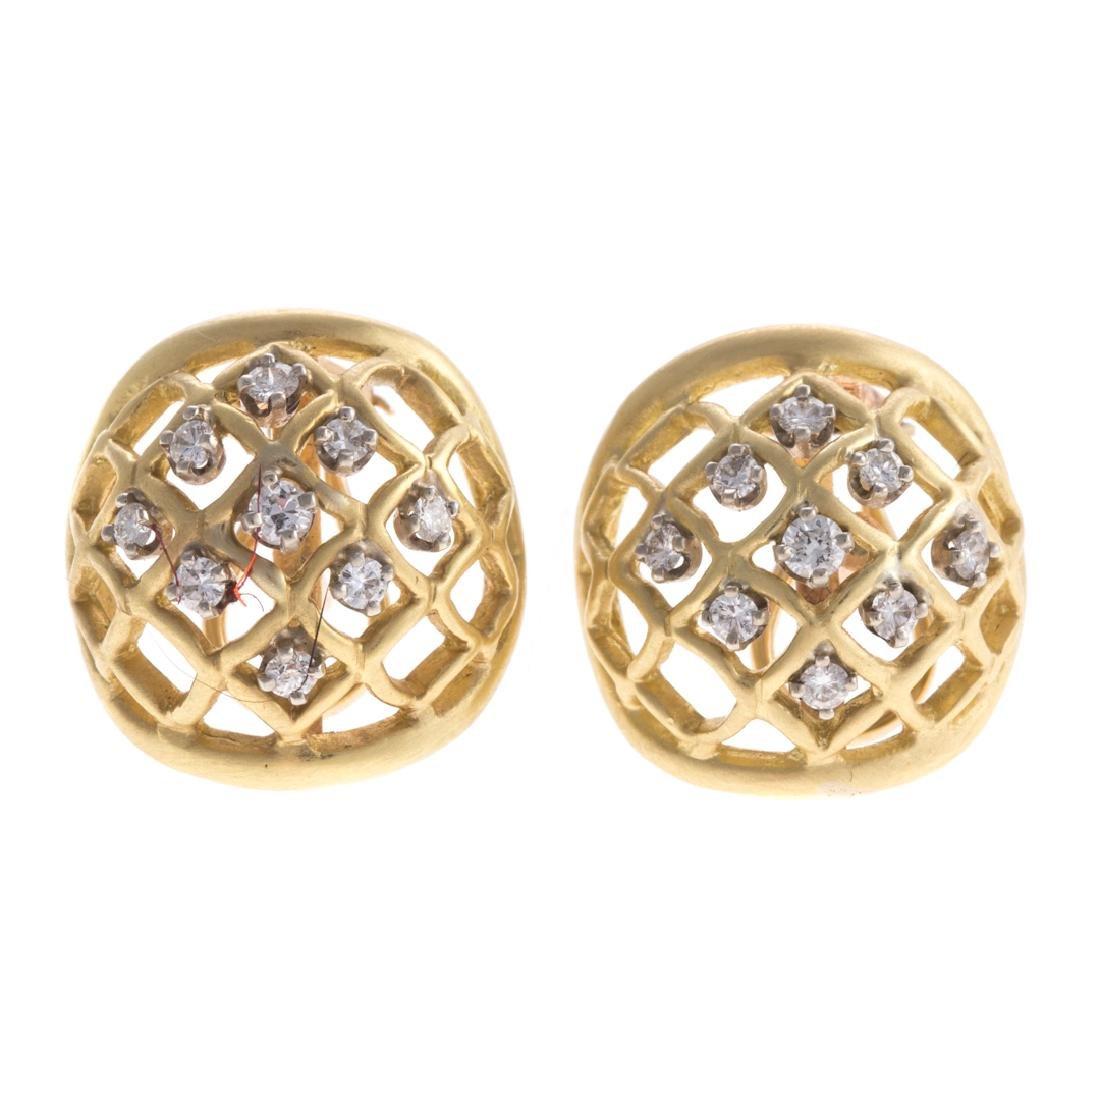 A Pair of Lady's 14K Lattice Diamond Earrings